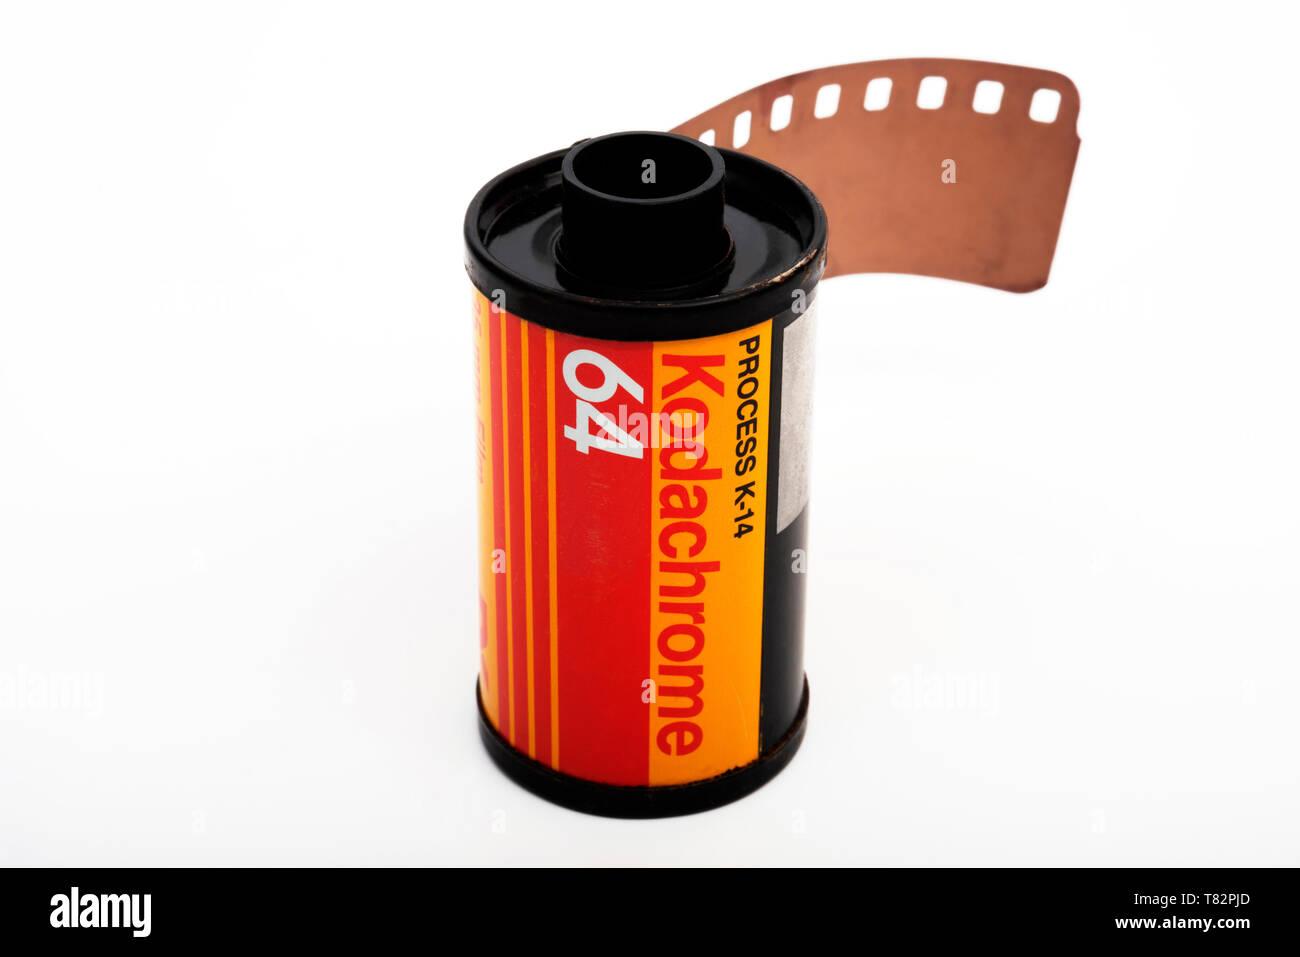 Kodachrome Film Stock Photos & Kodachrome Film Stock Images